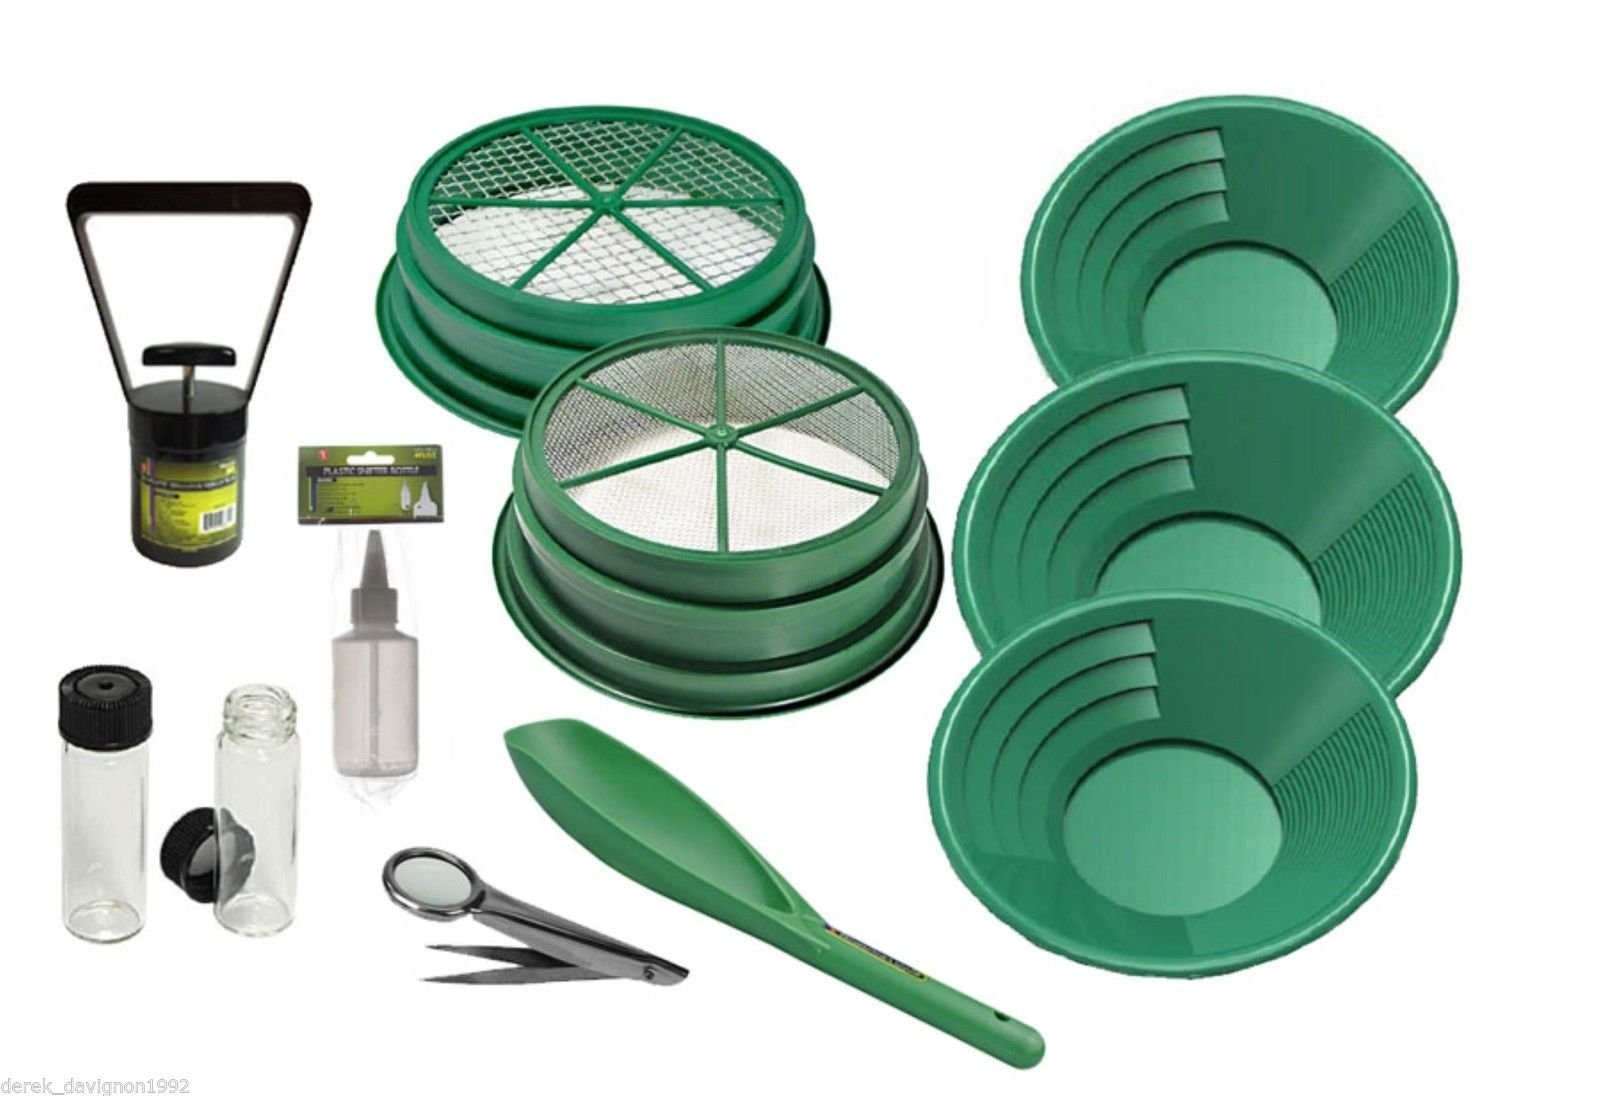 11pc Gold Panning Kit 1/4 & 1/2 Classifiers 14'' 10'' 8'' Green Gold Pans, Sniffer Bottle, 2 Vials, Scoop, Tweezers with Magnifier & Black Sand Magnet